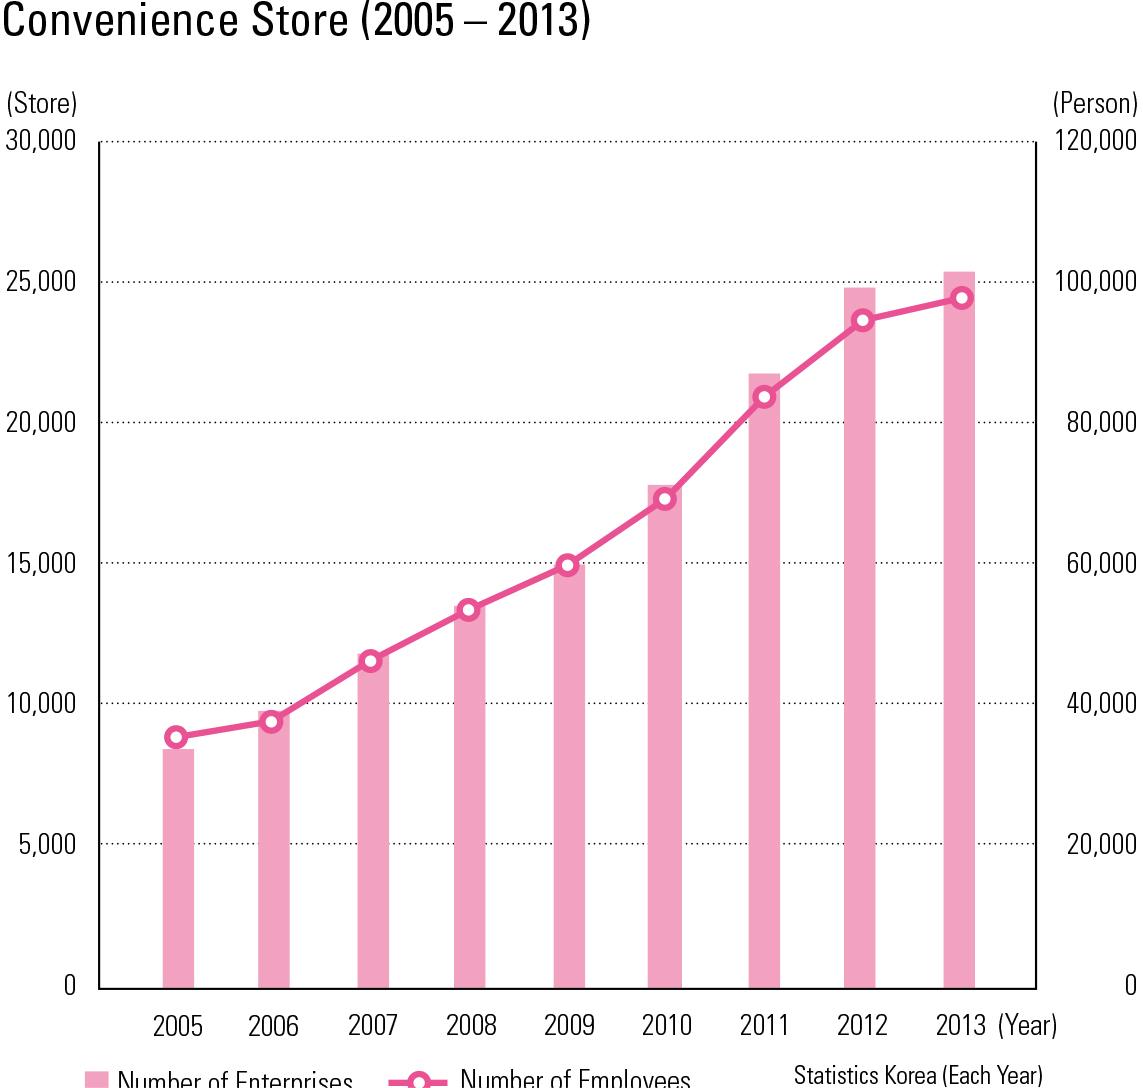 "Convenience Store (2005 – 2013)<p class=""oz_zoom"" zimg=""http://imagedata.cafe24.com/us_3/us3_185-4_2.jpg""><span style=""font-family:Nanum Myeongjo;""><span style=""font-size:18px;""><span class=""label label-danger"">UPDATE DATA</span></span></p>"